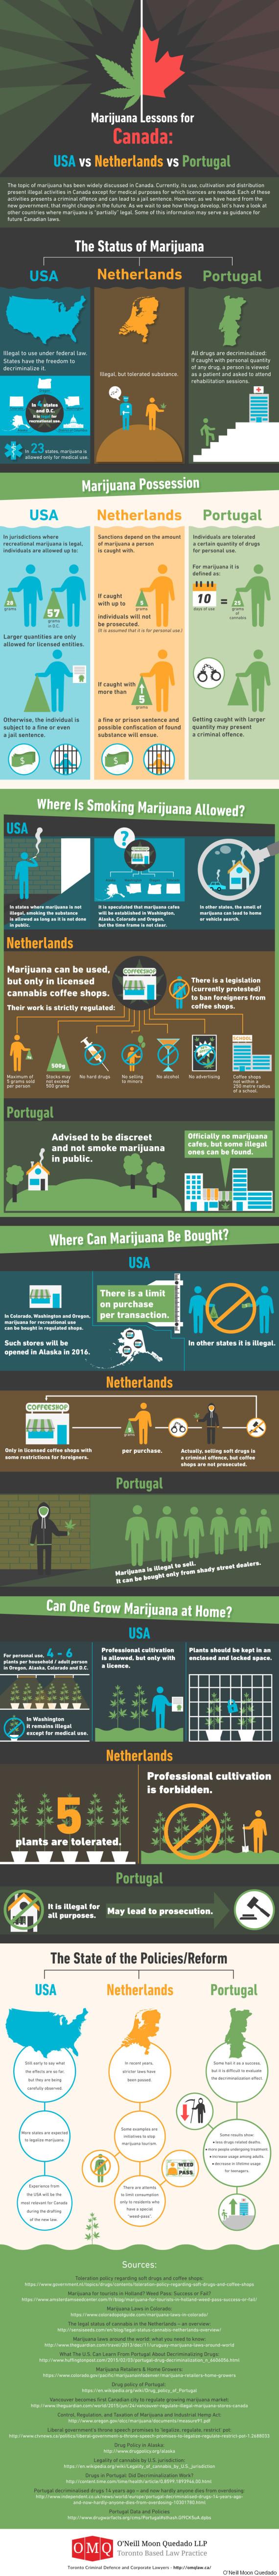 Marijuana Law Comparison Infographic